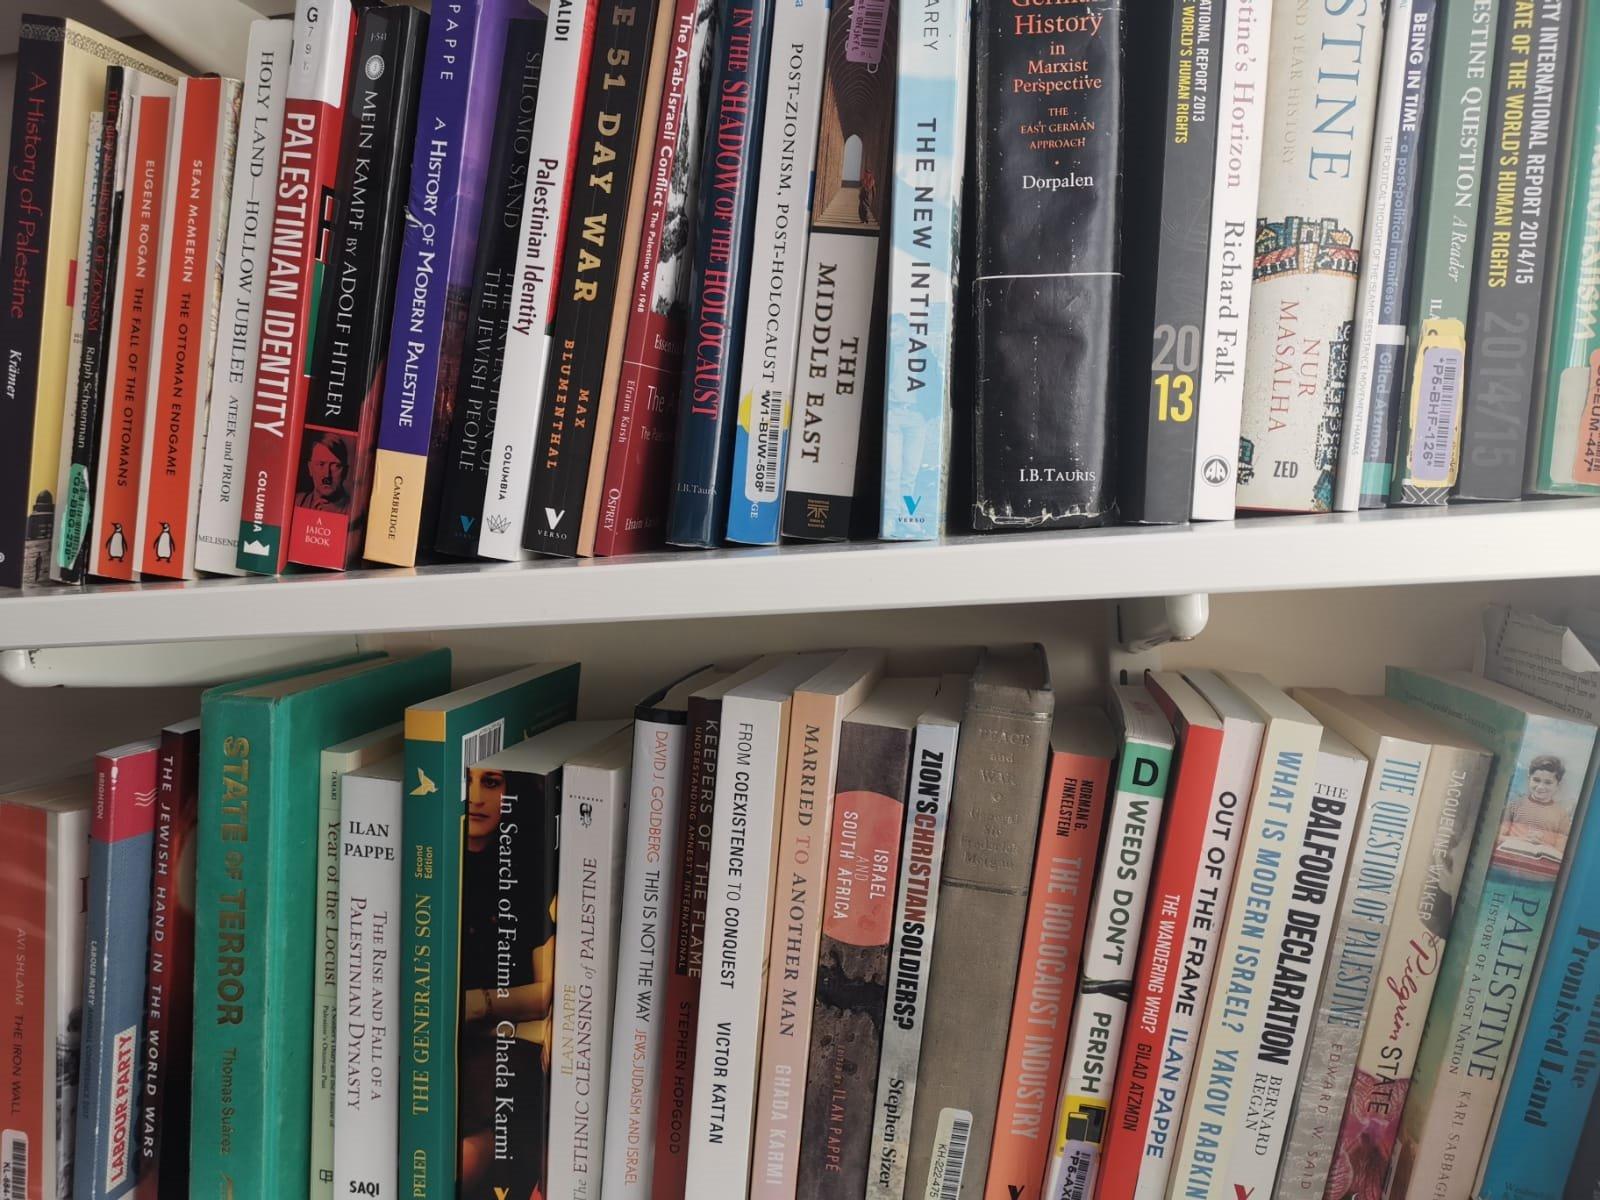 collier's bookshelf